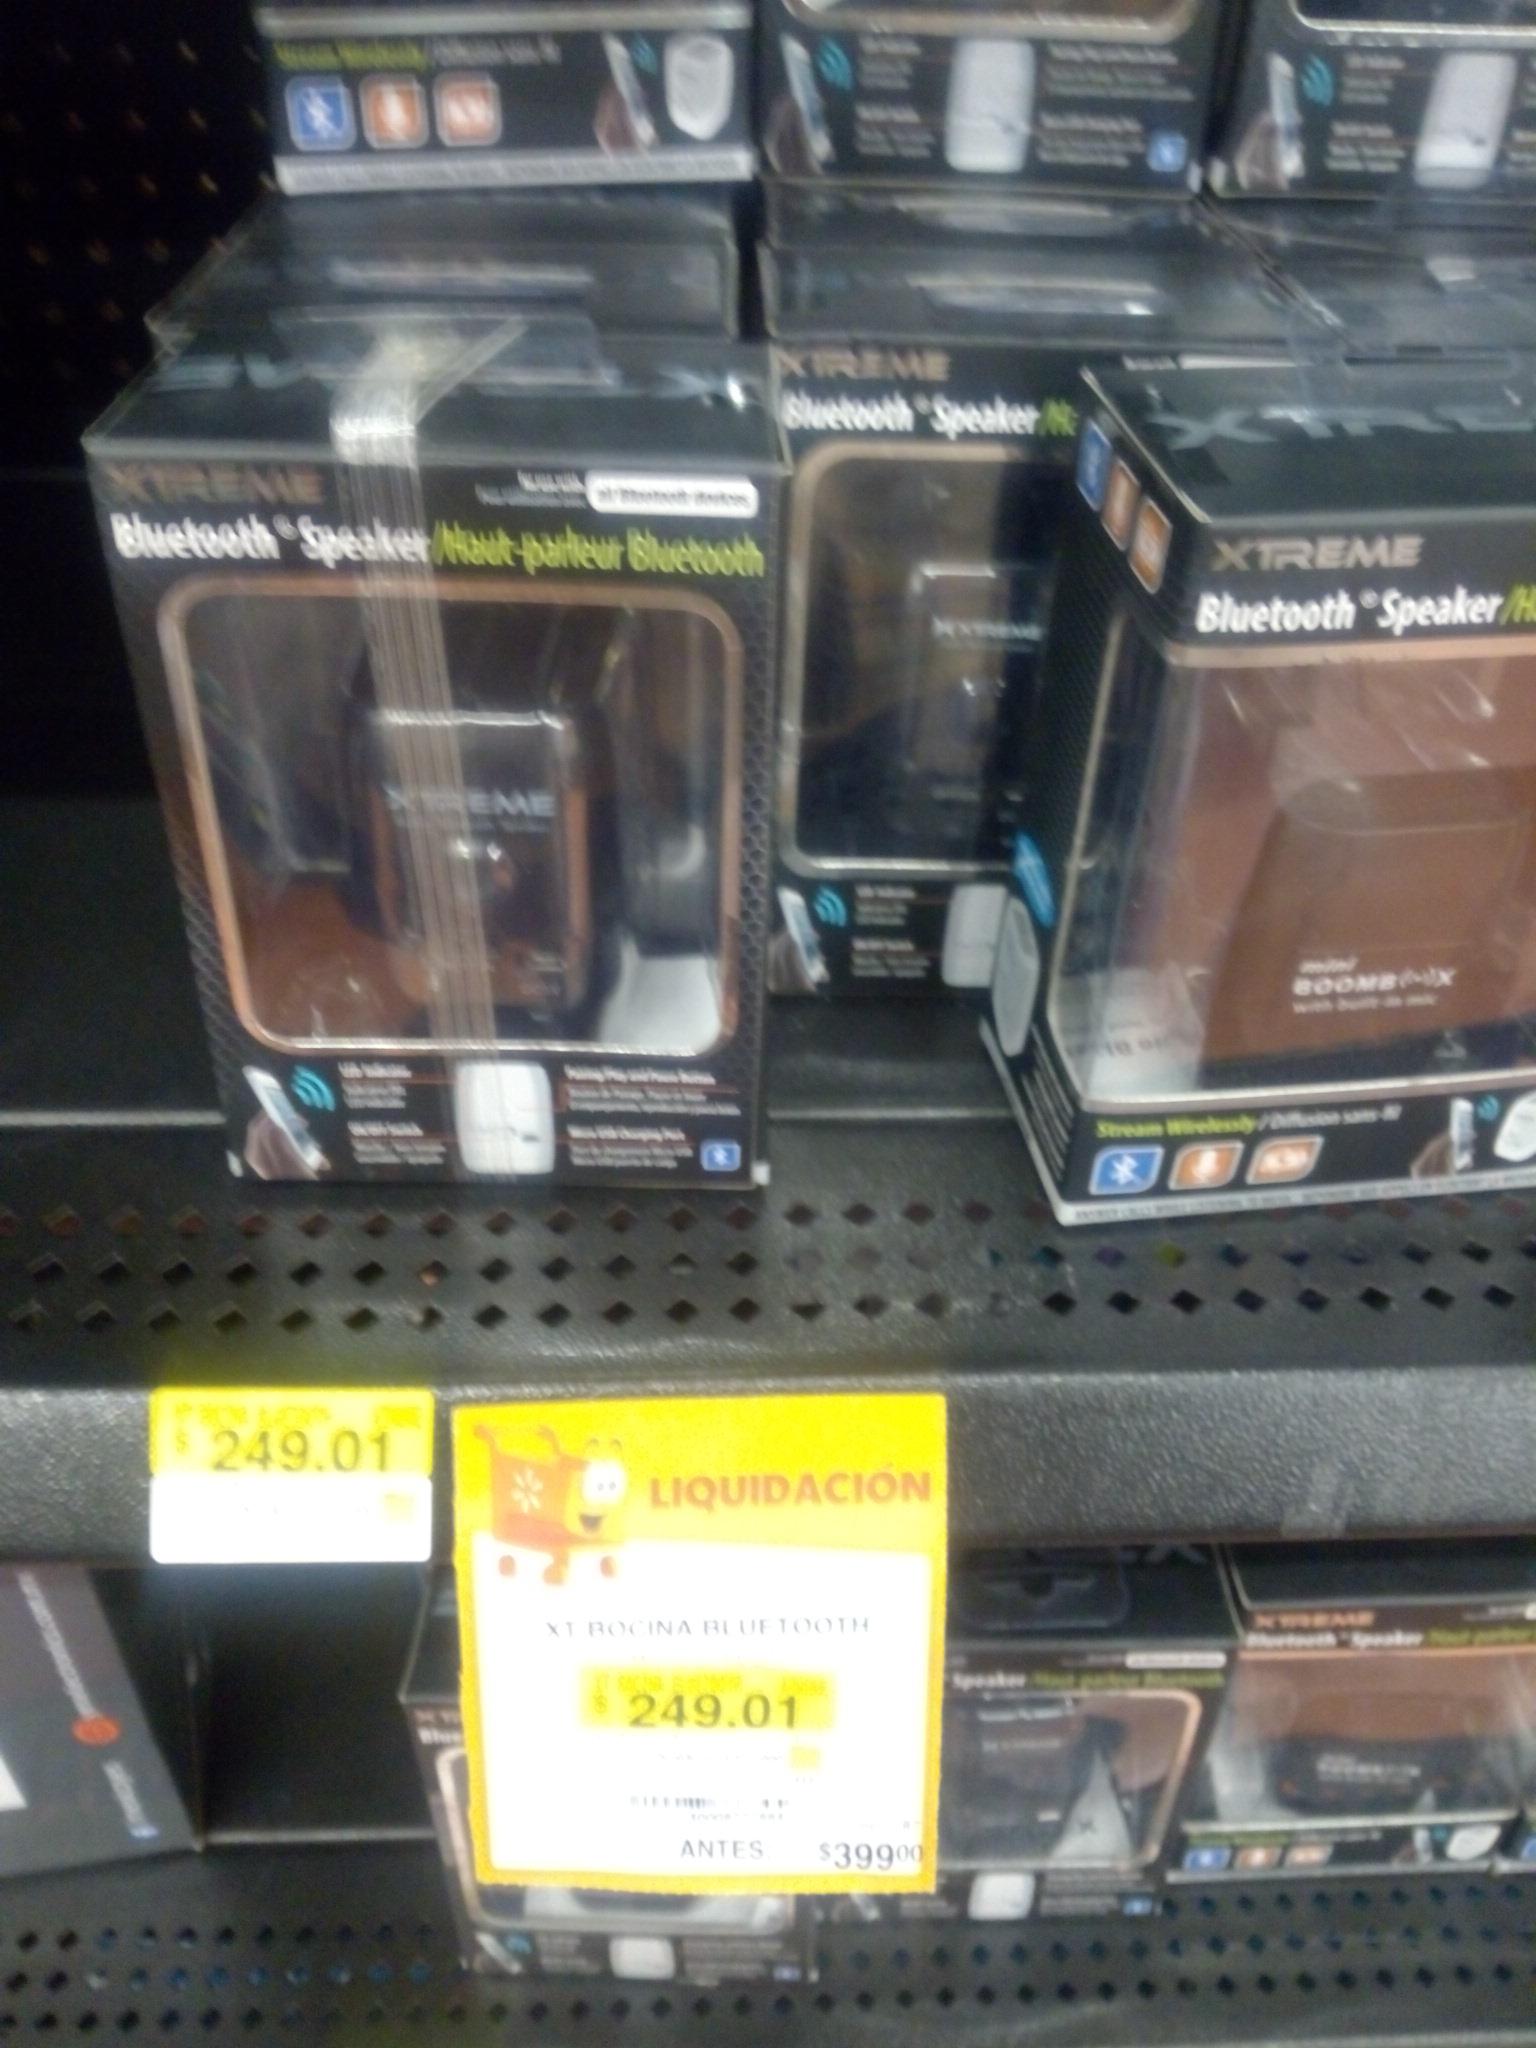 Walmart : Bocina Bluetooth Xtreme a 249.01